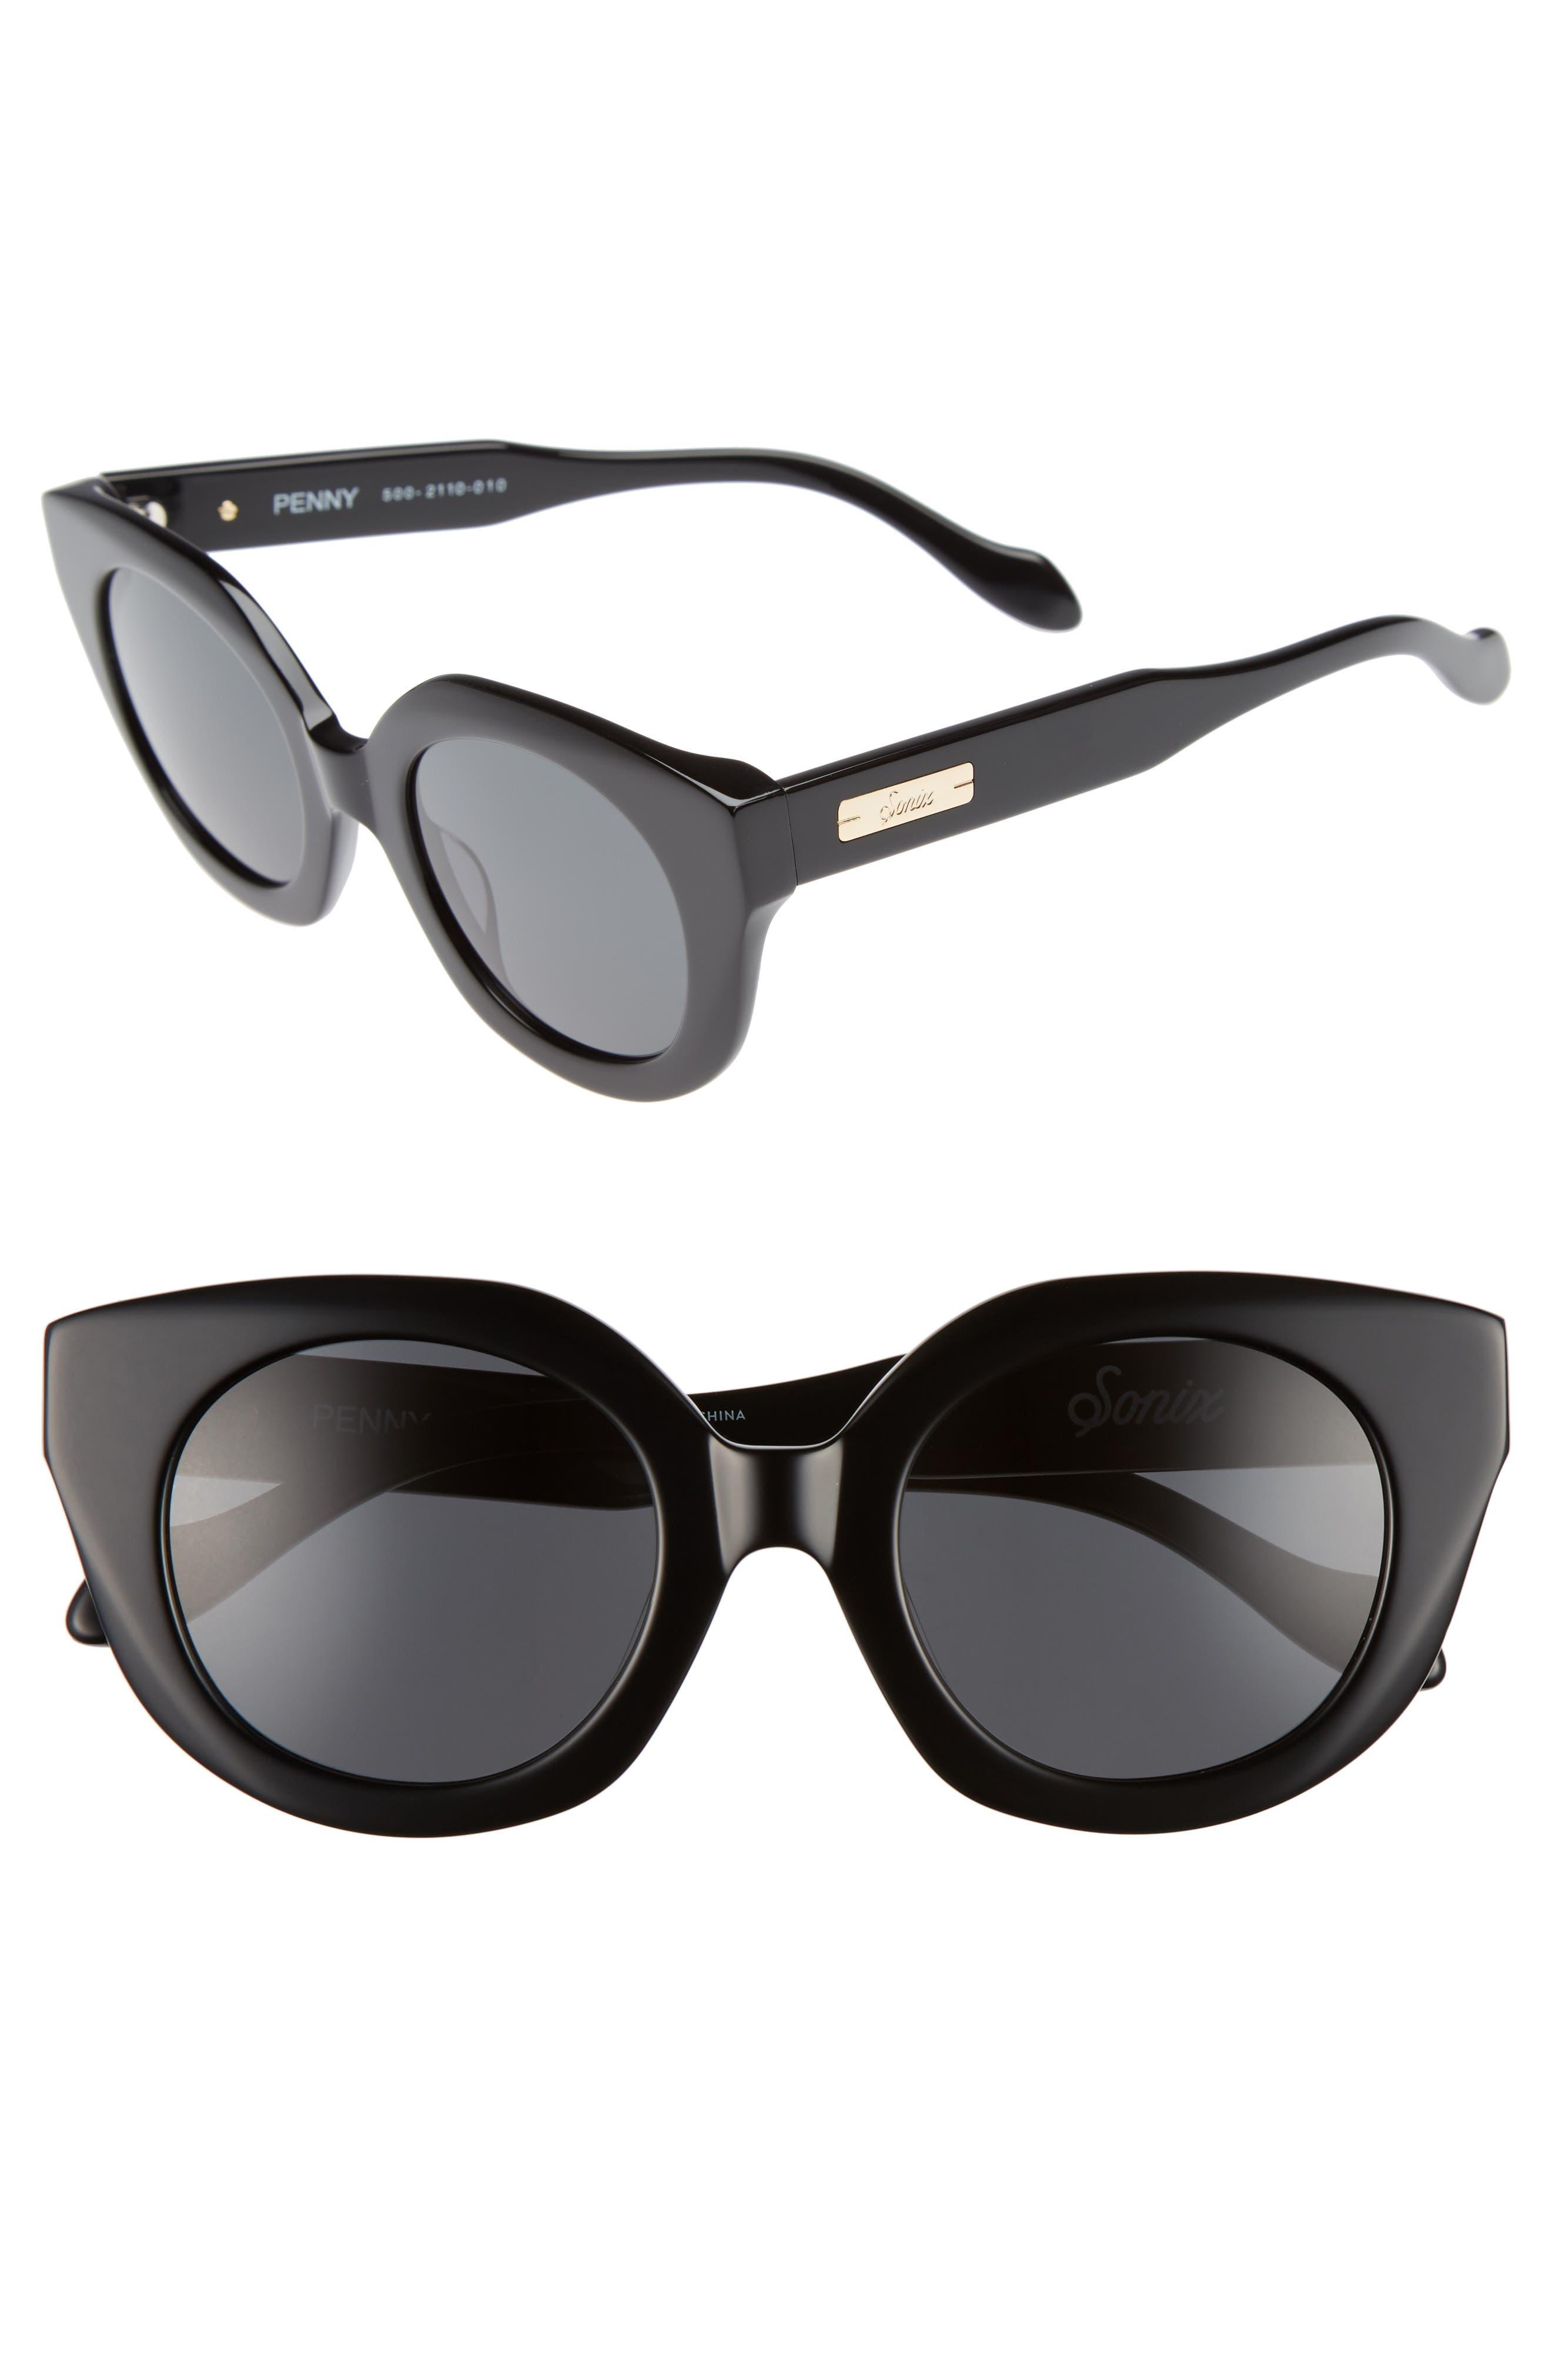 Penny 48mm Cat Eye Sunglasses,                         Main,                         color, Black/ Black Solid